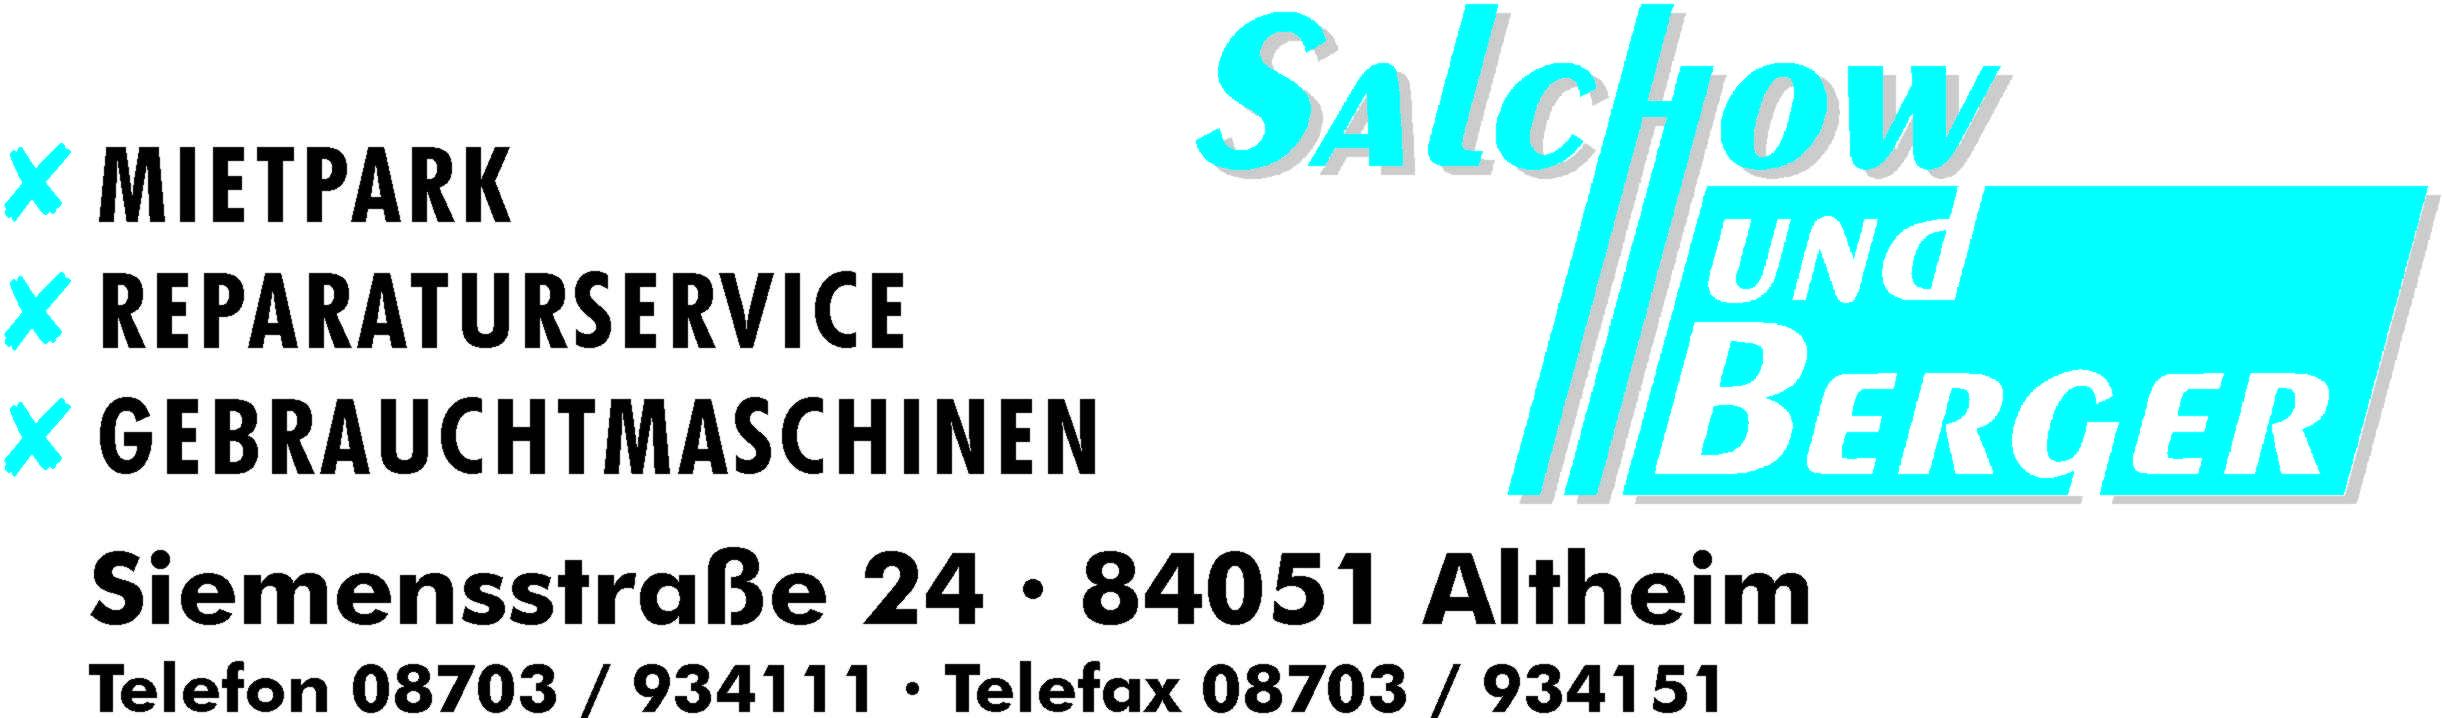 Logo der Firma Salchow & Berger Baubedarf GmbH in Altheim